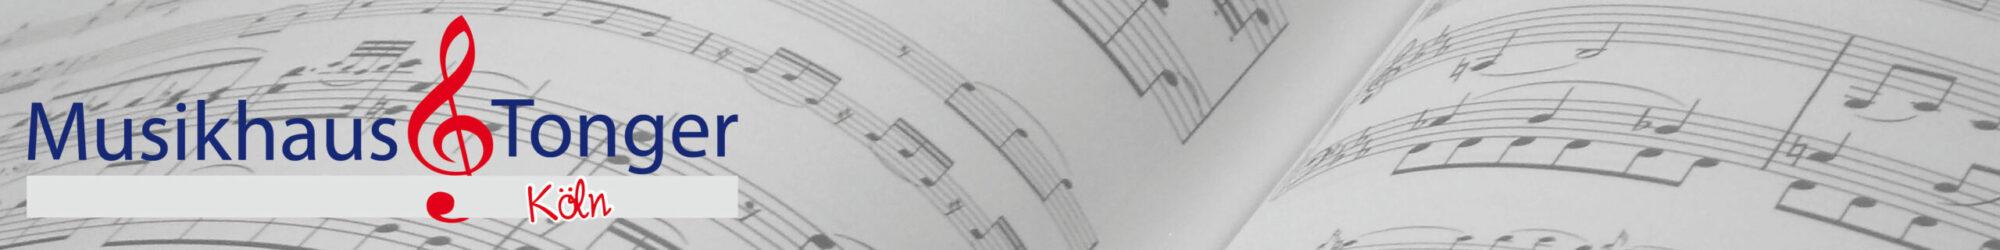 Musikhaus Tonger